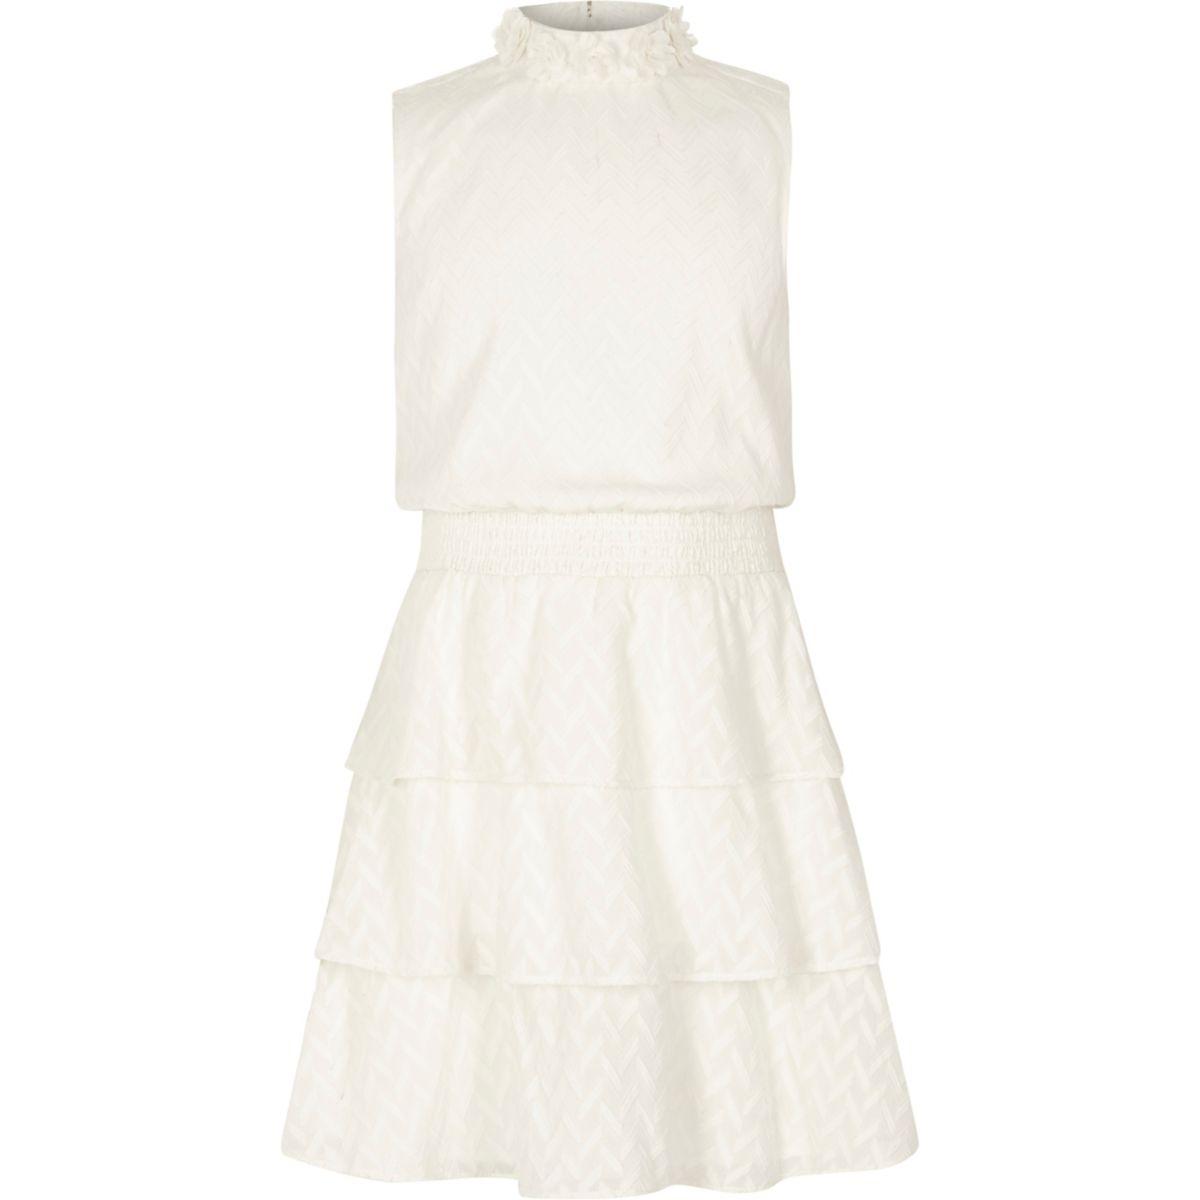 Girls frill skirt high neck sleeveless dress